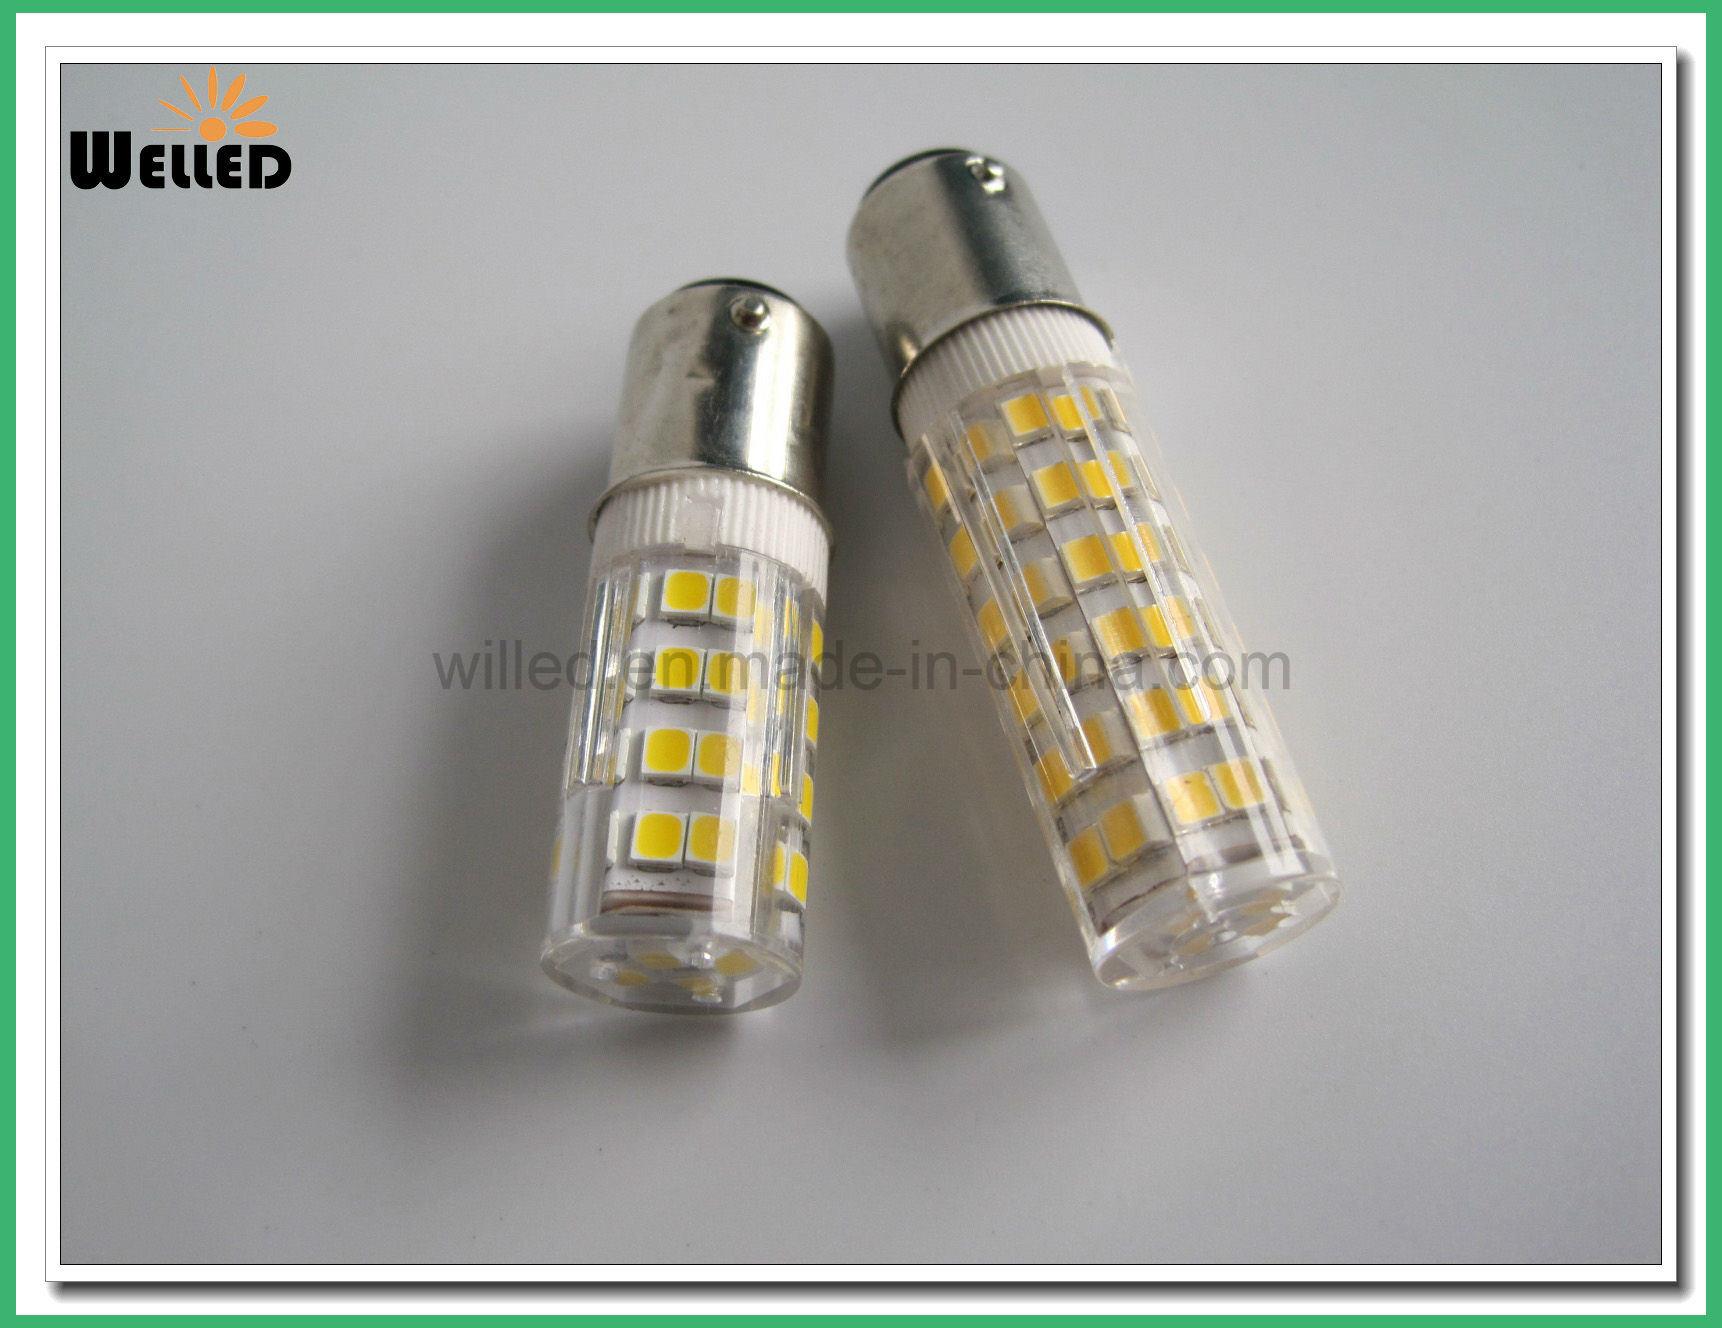 4W High Power LED Bulb Light G9 E11 E12 Ba15D AC110V 220V Dimmable LED Lamp 51PCS SMD2835